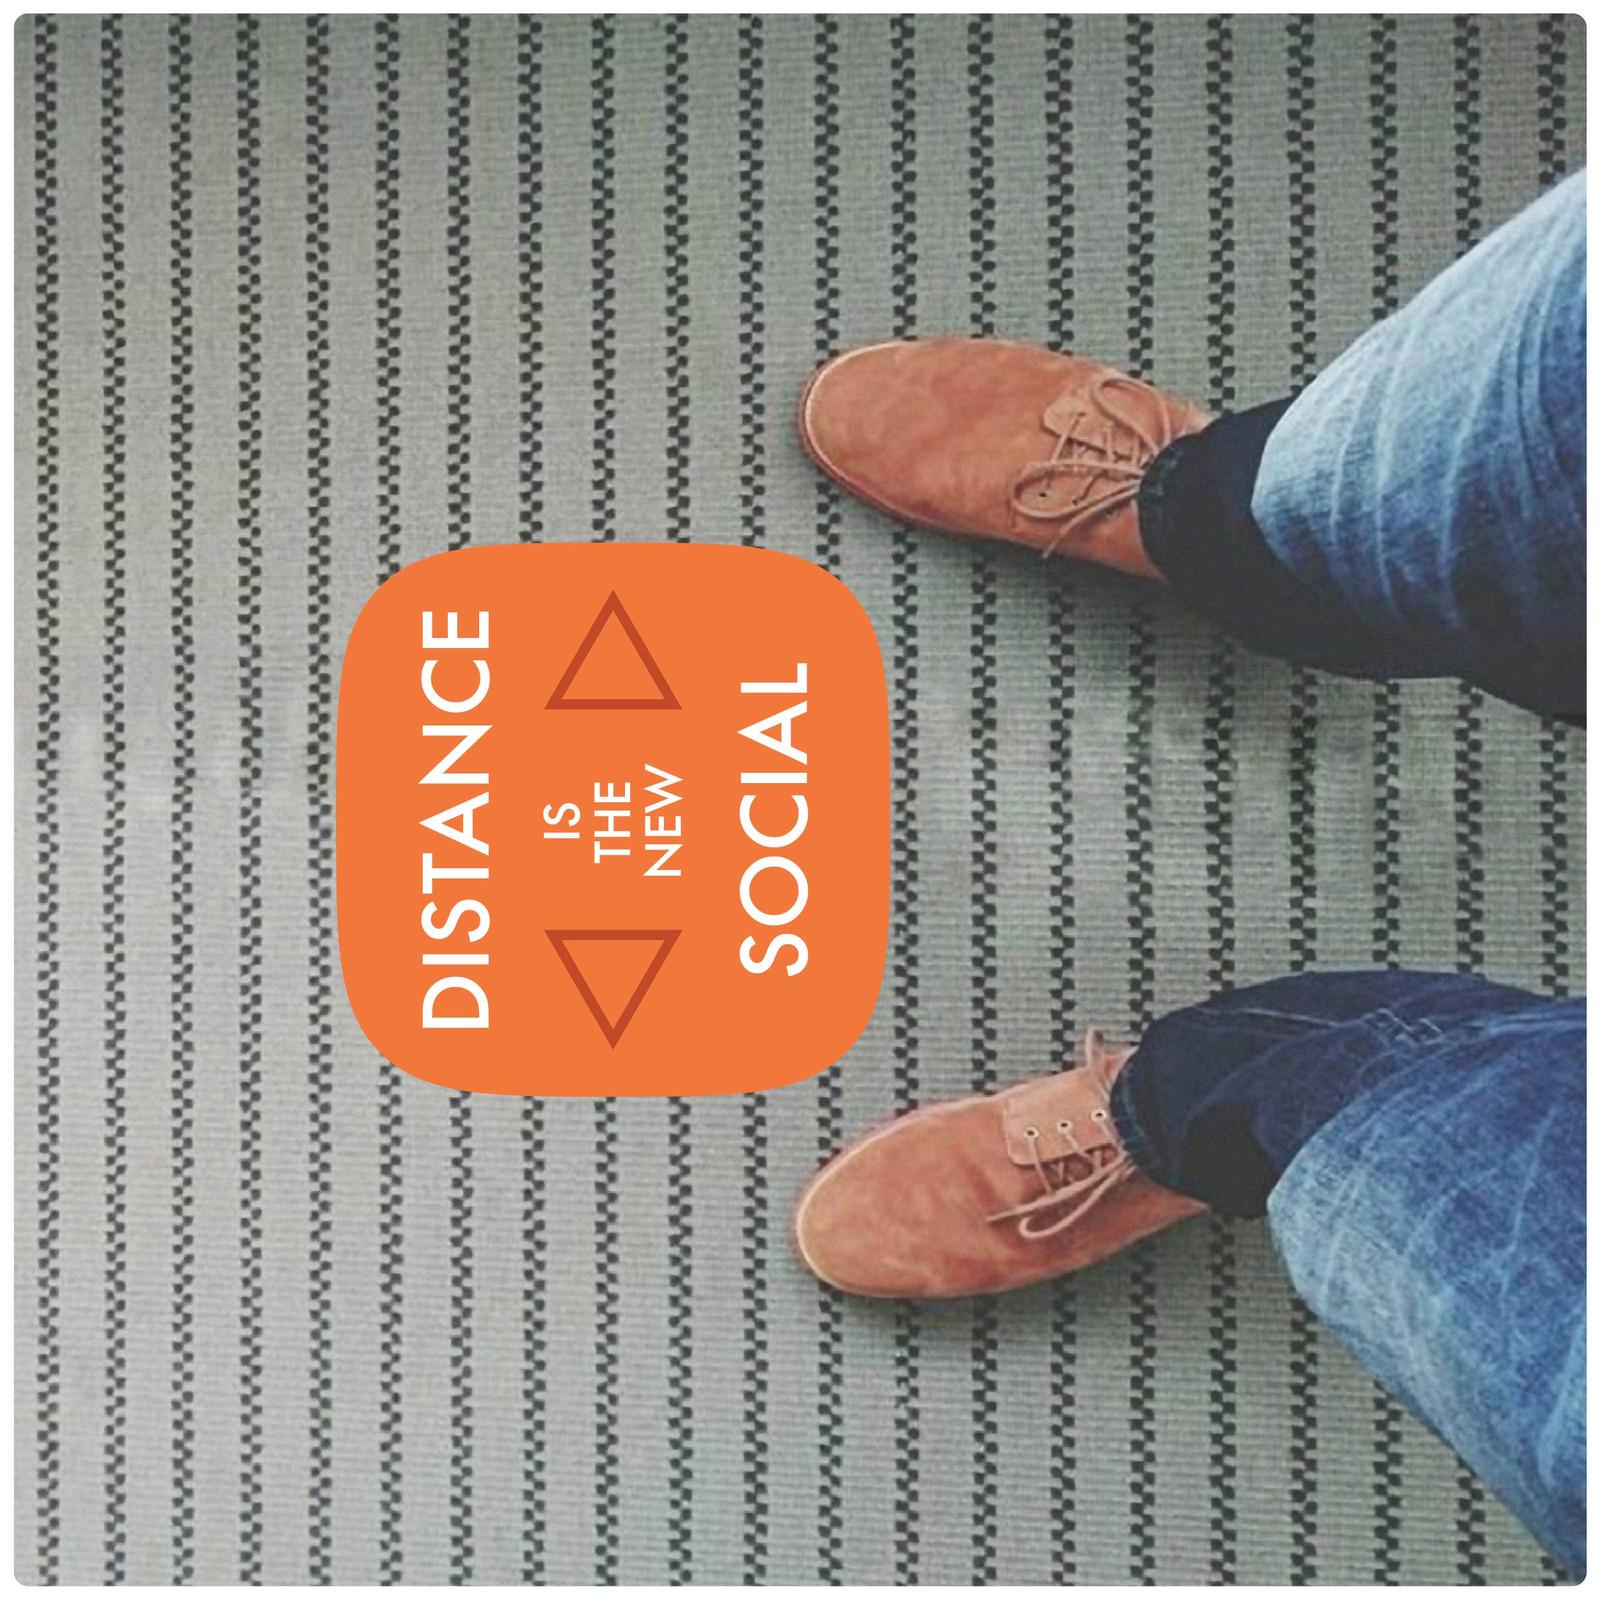 social distancing floor marker for carpet, photo, contemporary mix Self-adhesive Corona virus floor marker to help social distancing